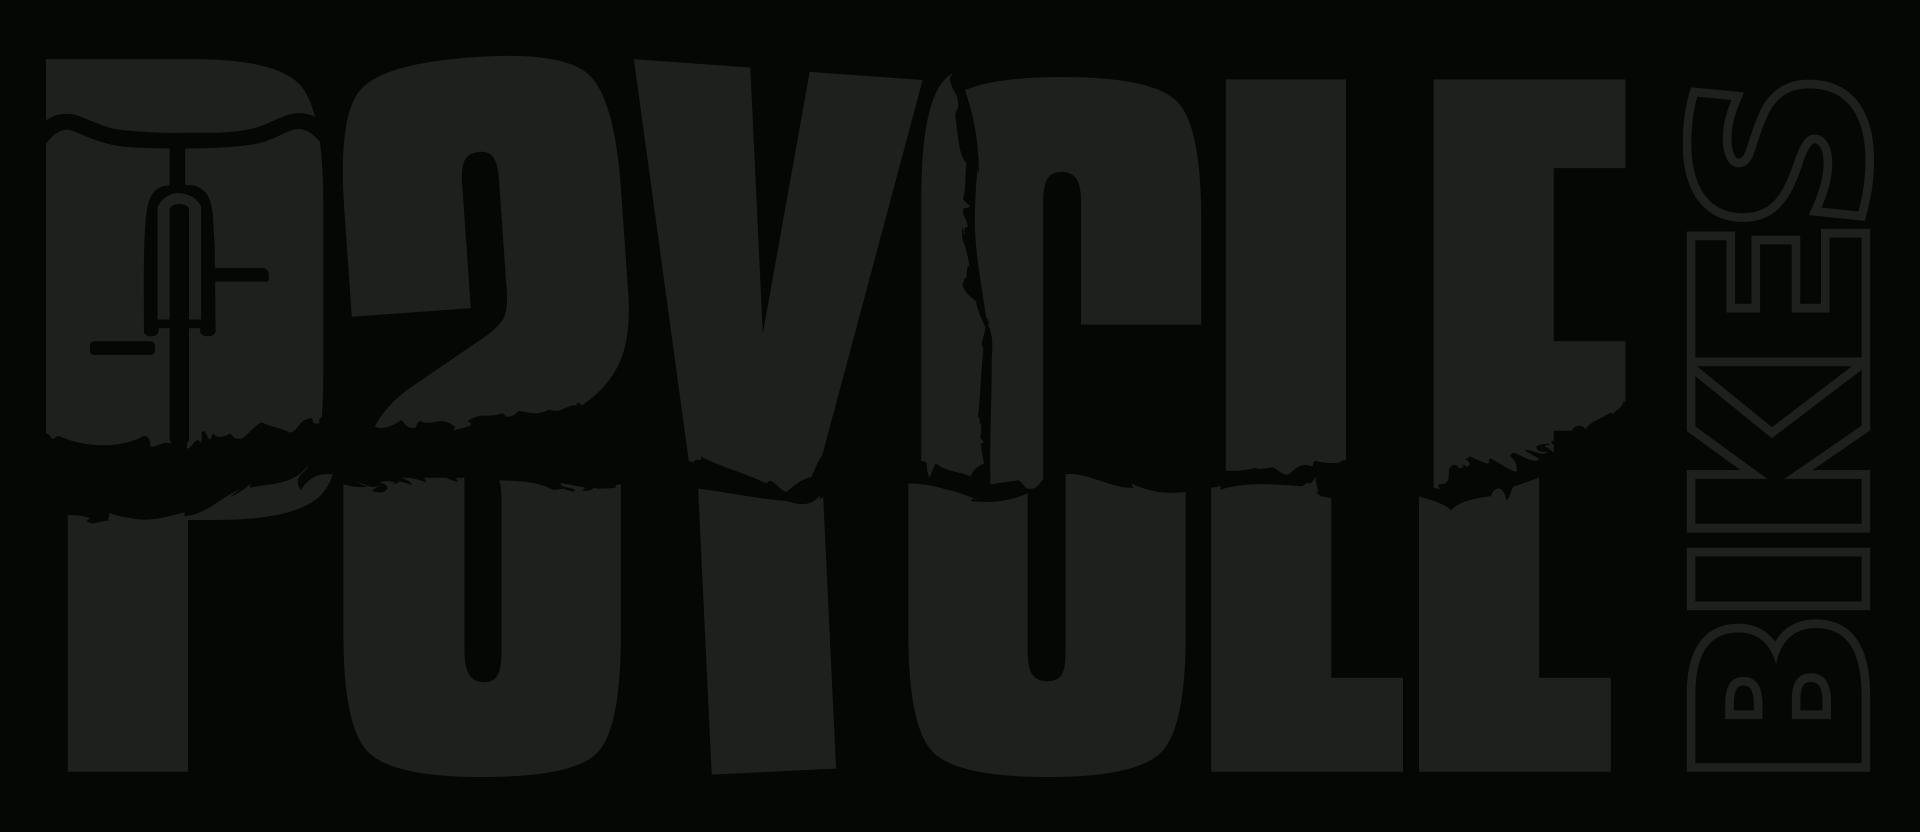 Psycle_Bikes_Site_Slider_1920x832_logo_fundo_psycle